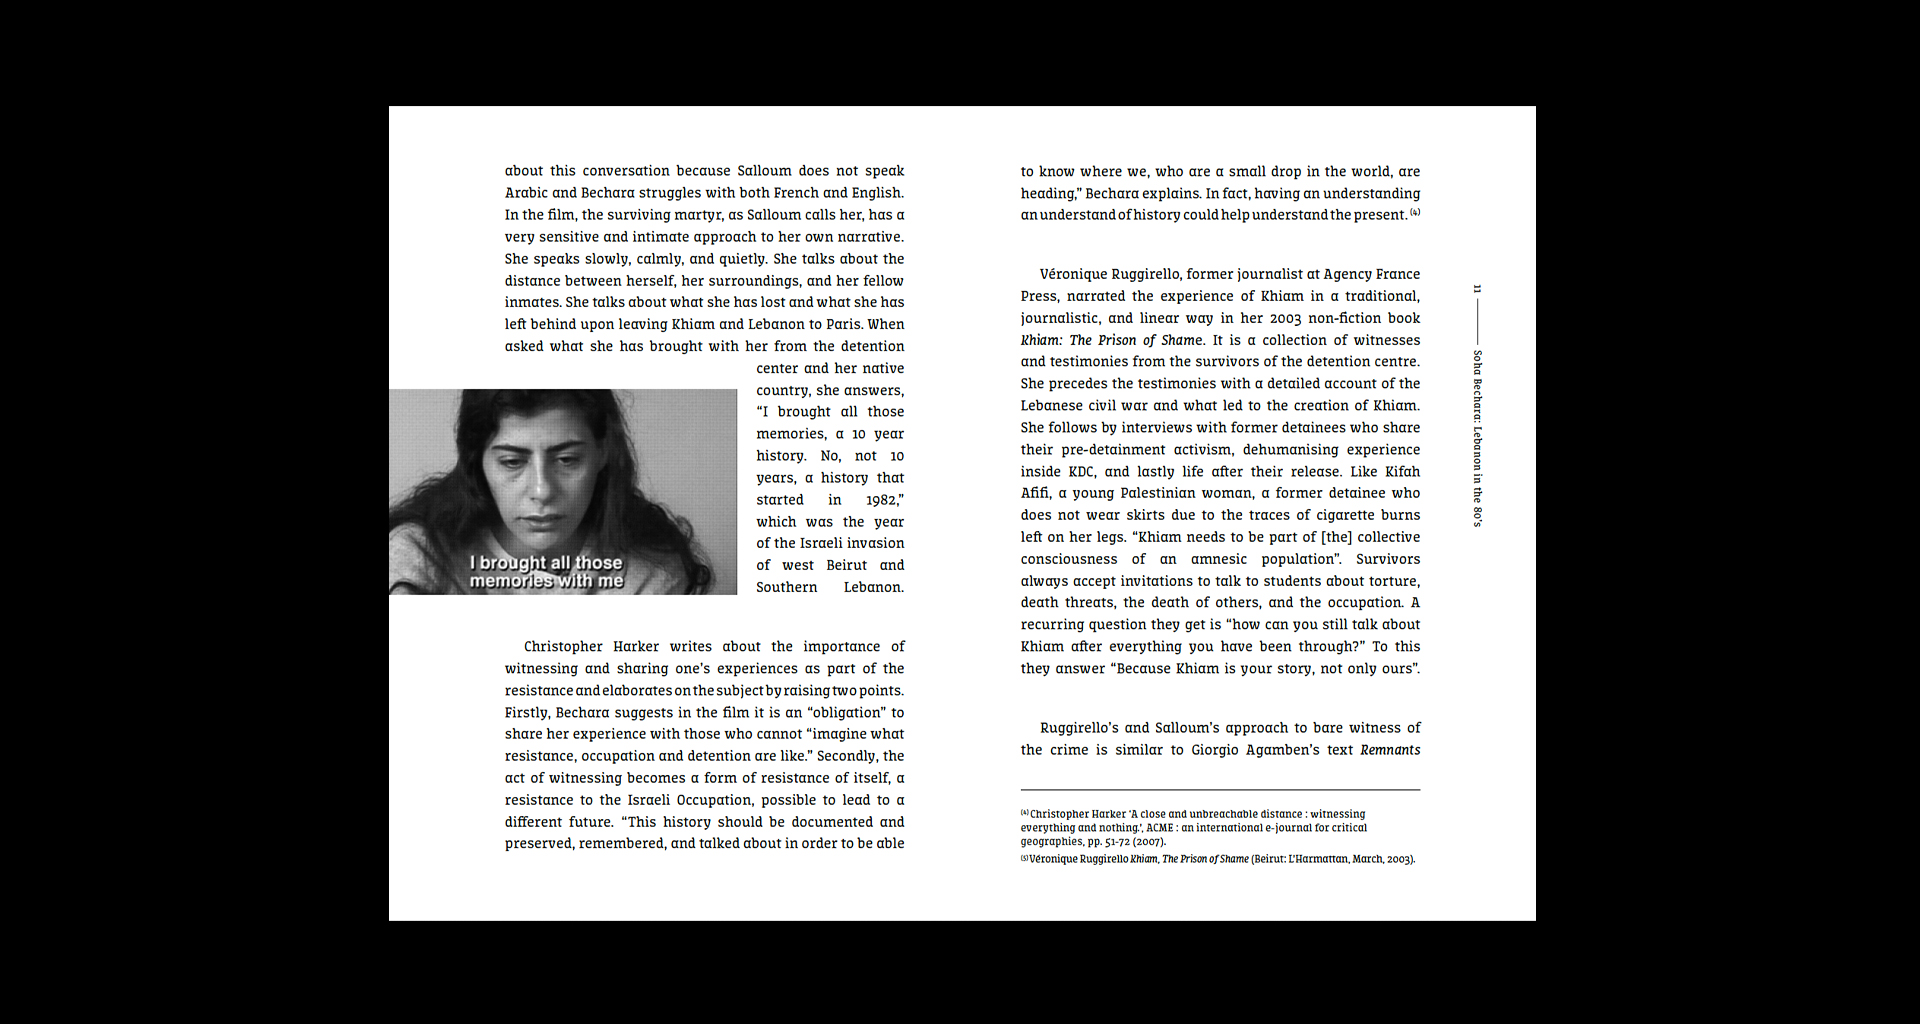 Dissertation_Photo_0011_Screenshot 2019-08-19 at 13.38.08.jpg